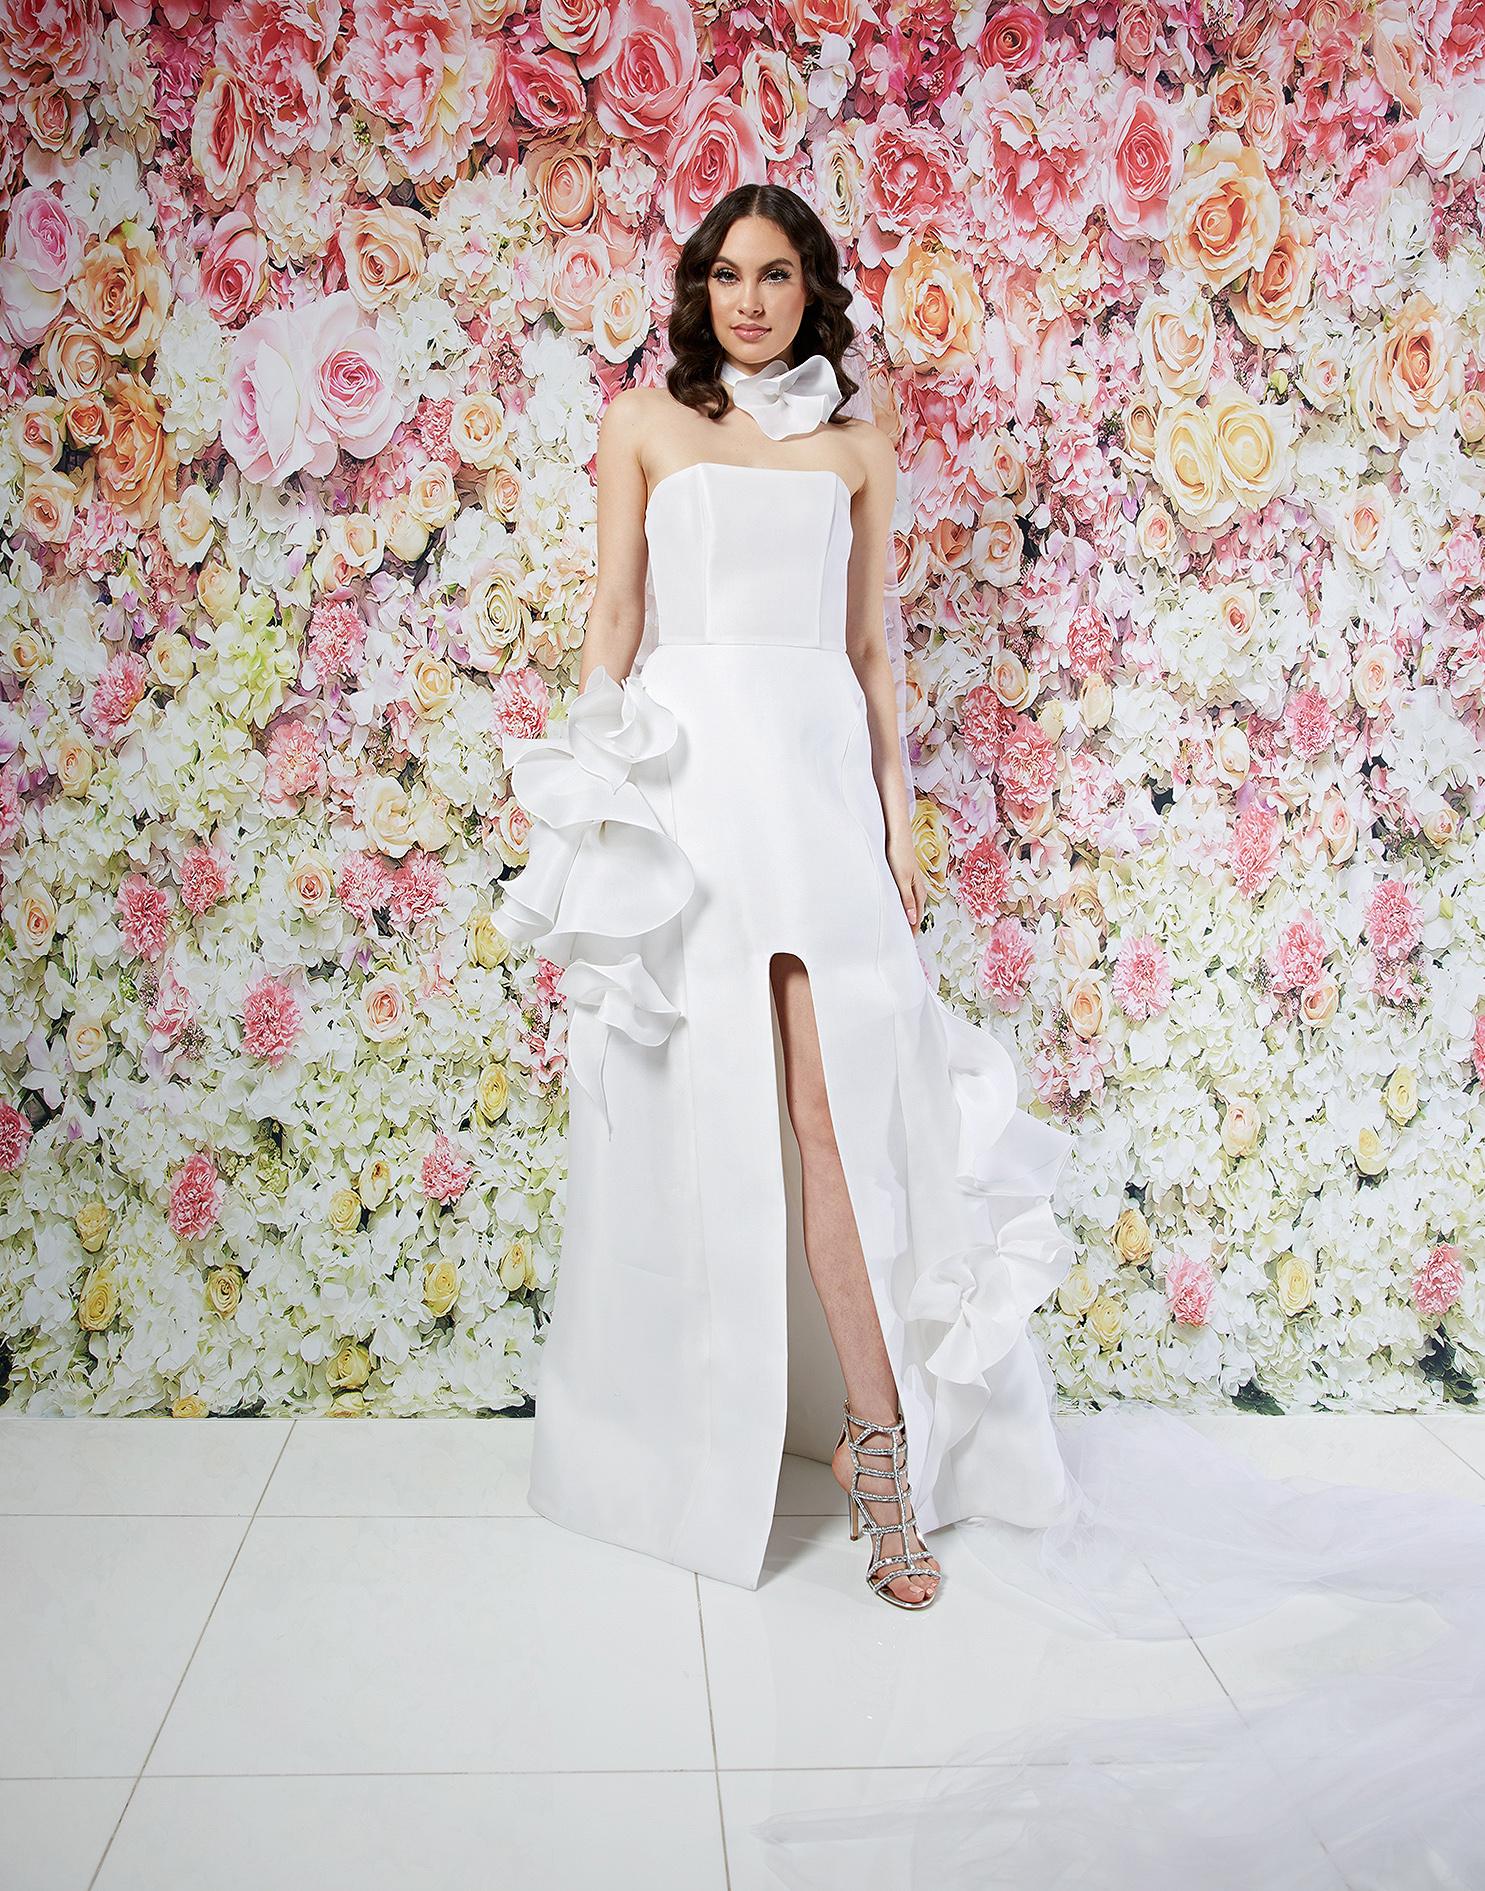 randi rahm wedding dress spring 2019 strapless a-line ruffle detail